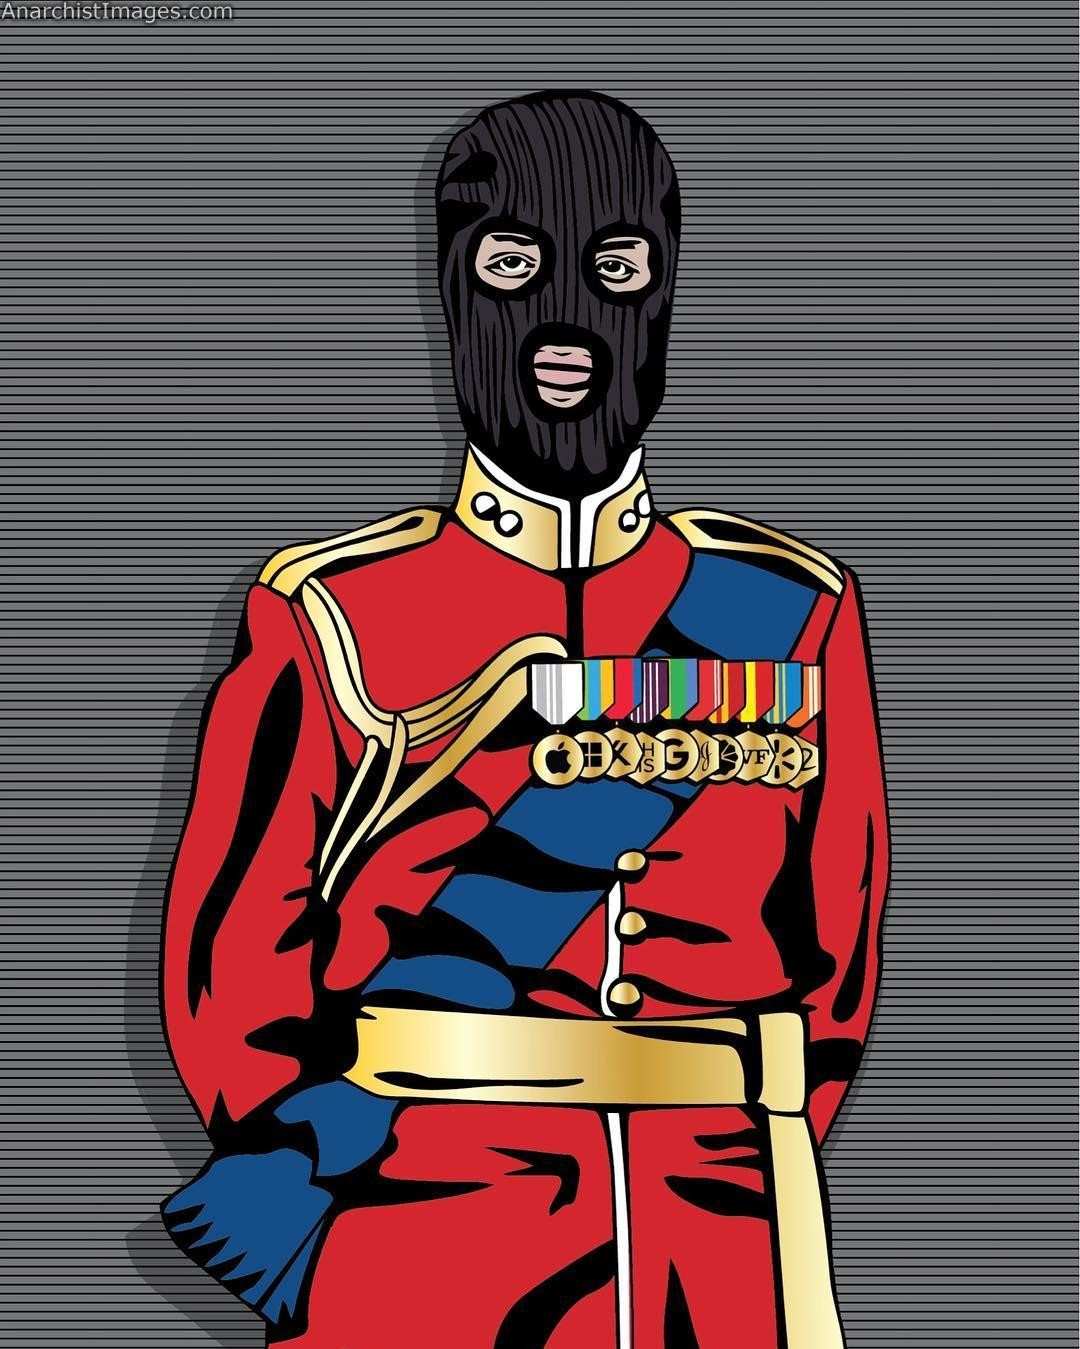 Corporate monarchy Digital illustration